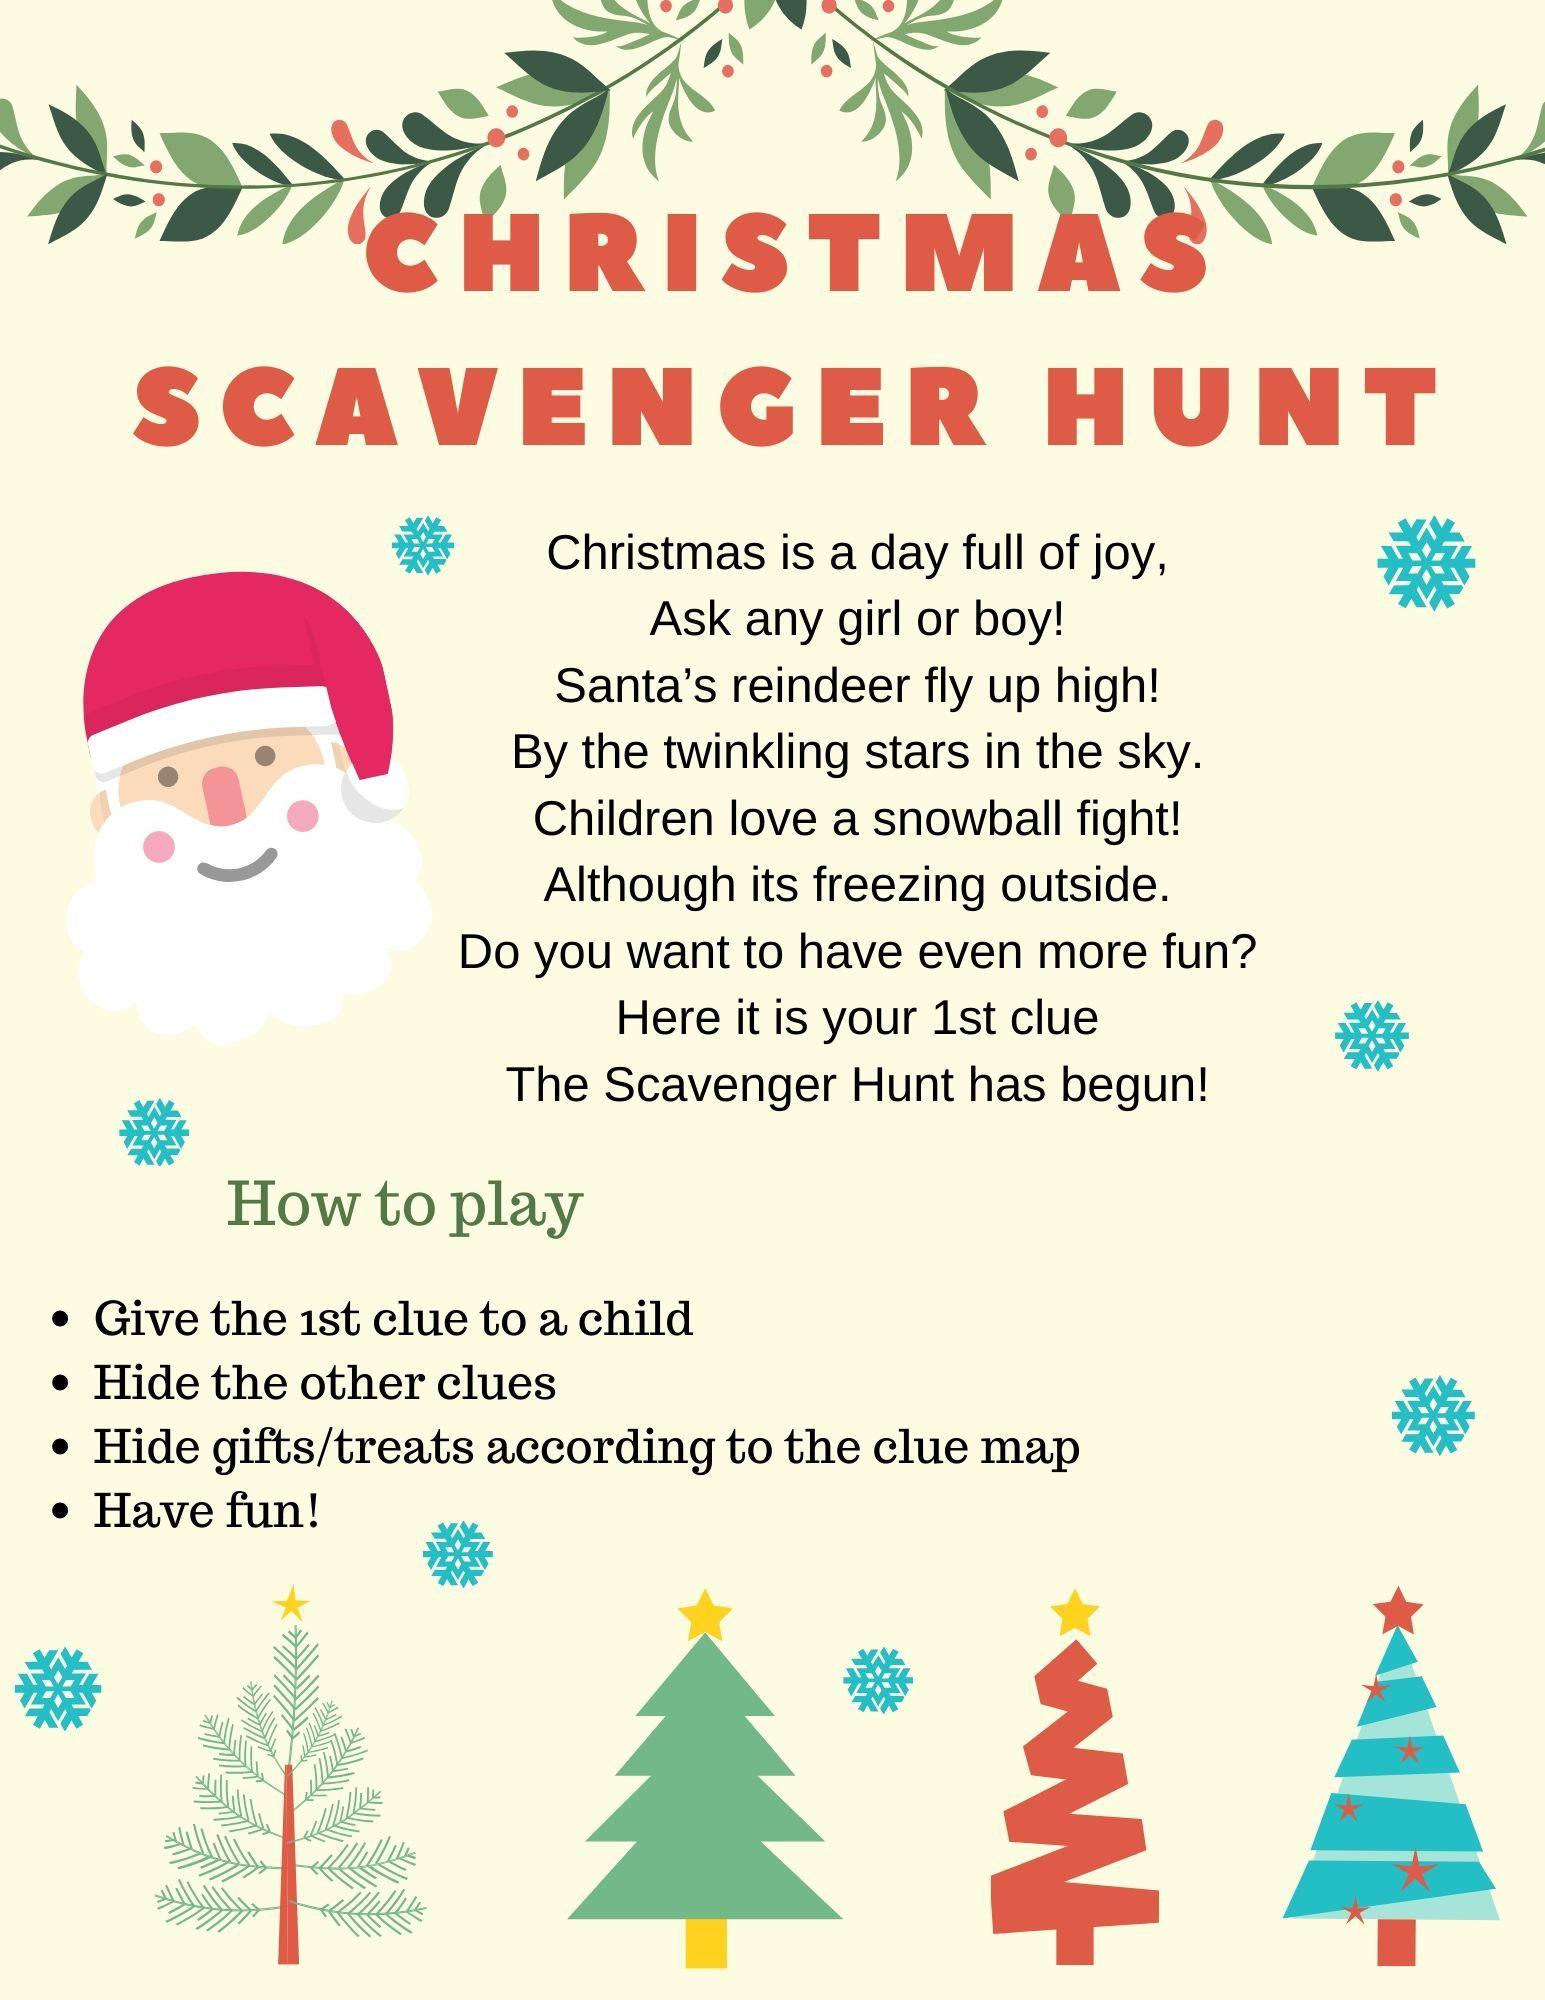 Merry Christmas Scavenger Hunt Riddles/Clues Christmas